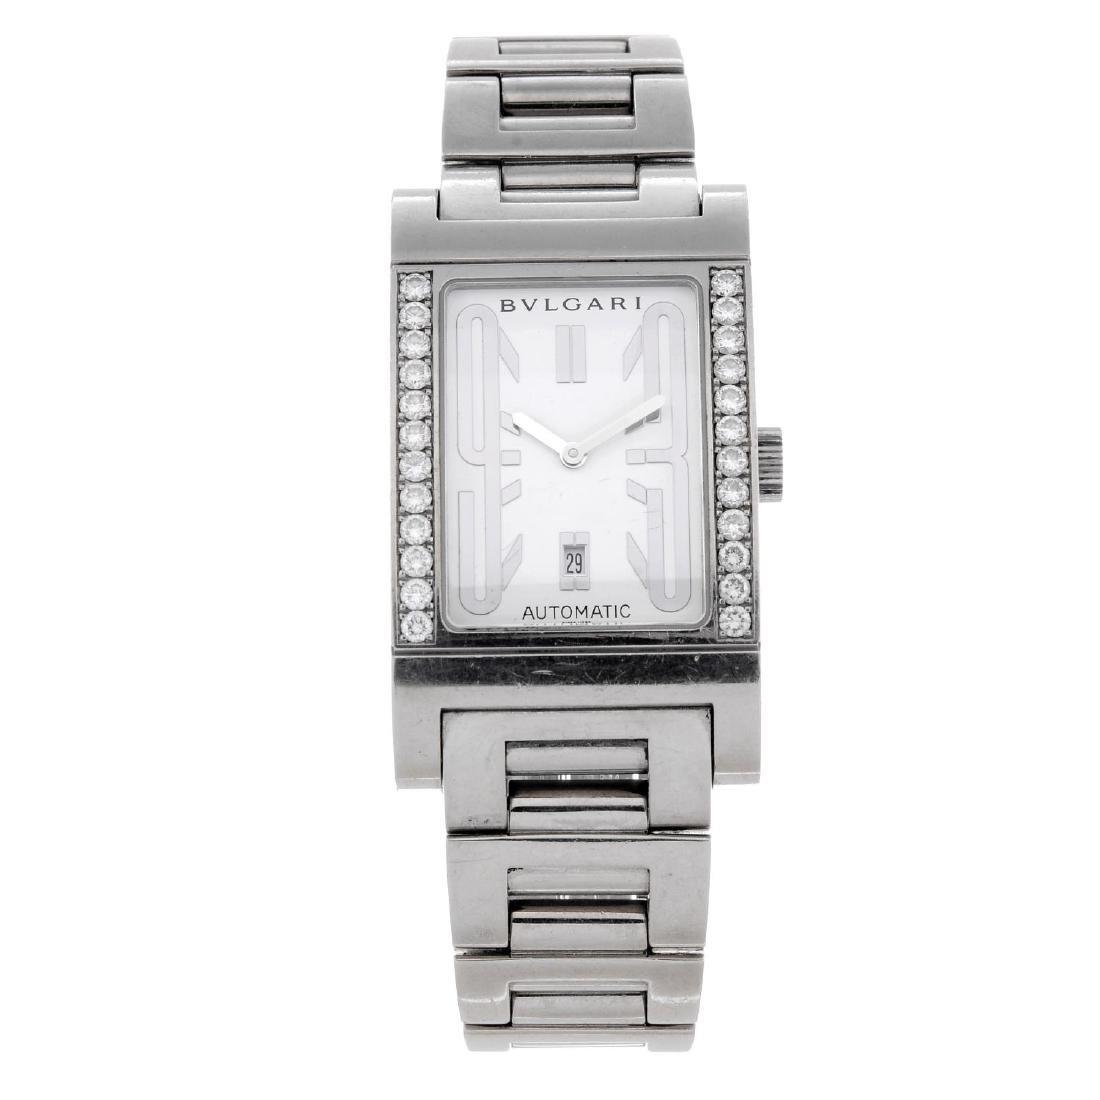 BULGARI - a mid-size Rettangolo bracelet watch. 18ct